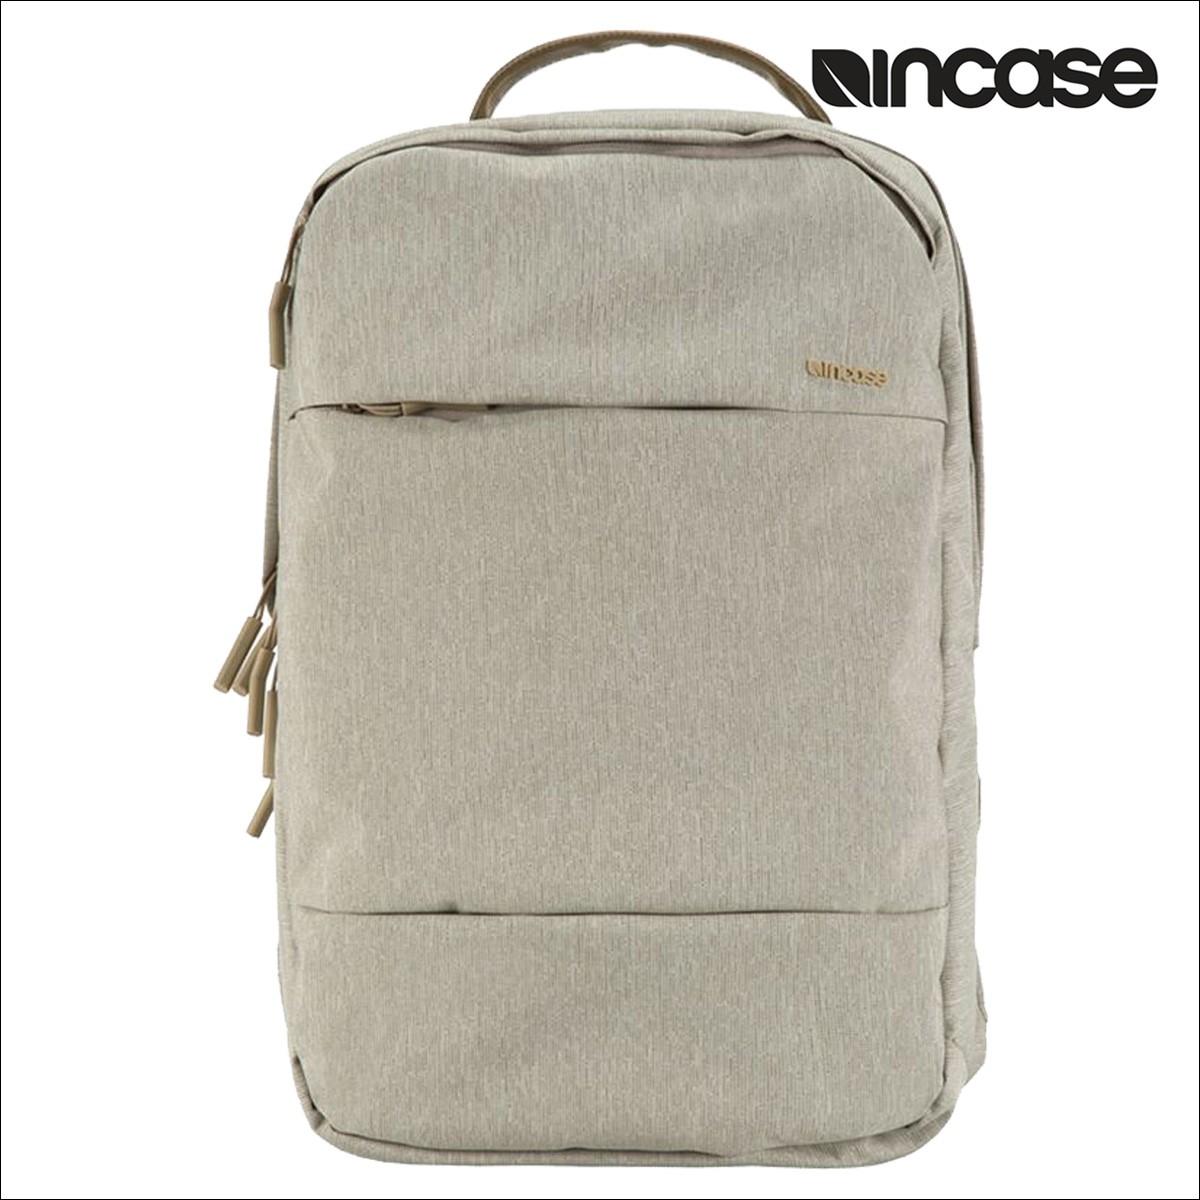 INCASE インケース バックパック リュック 19L CITY BACKPACK INCO100207 レディース メンズ ヘザーカーキ [4/11 新入荷]